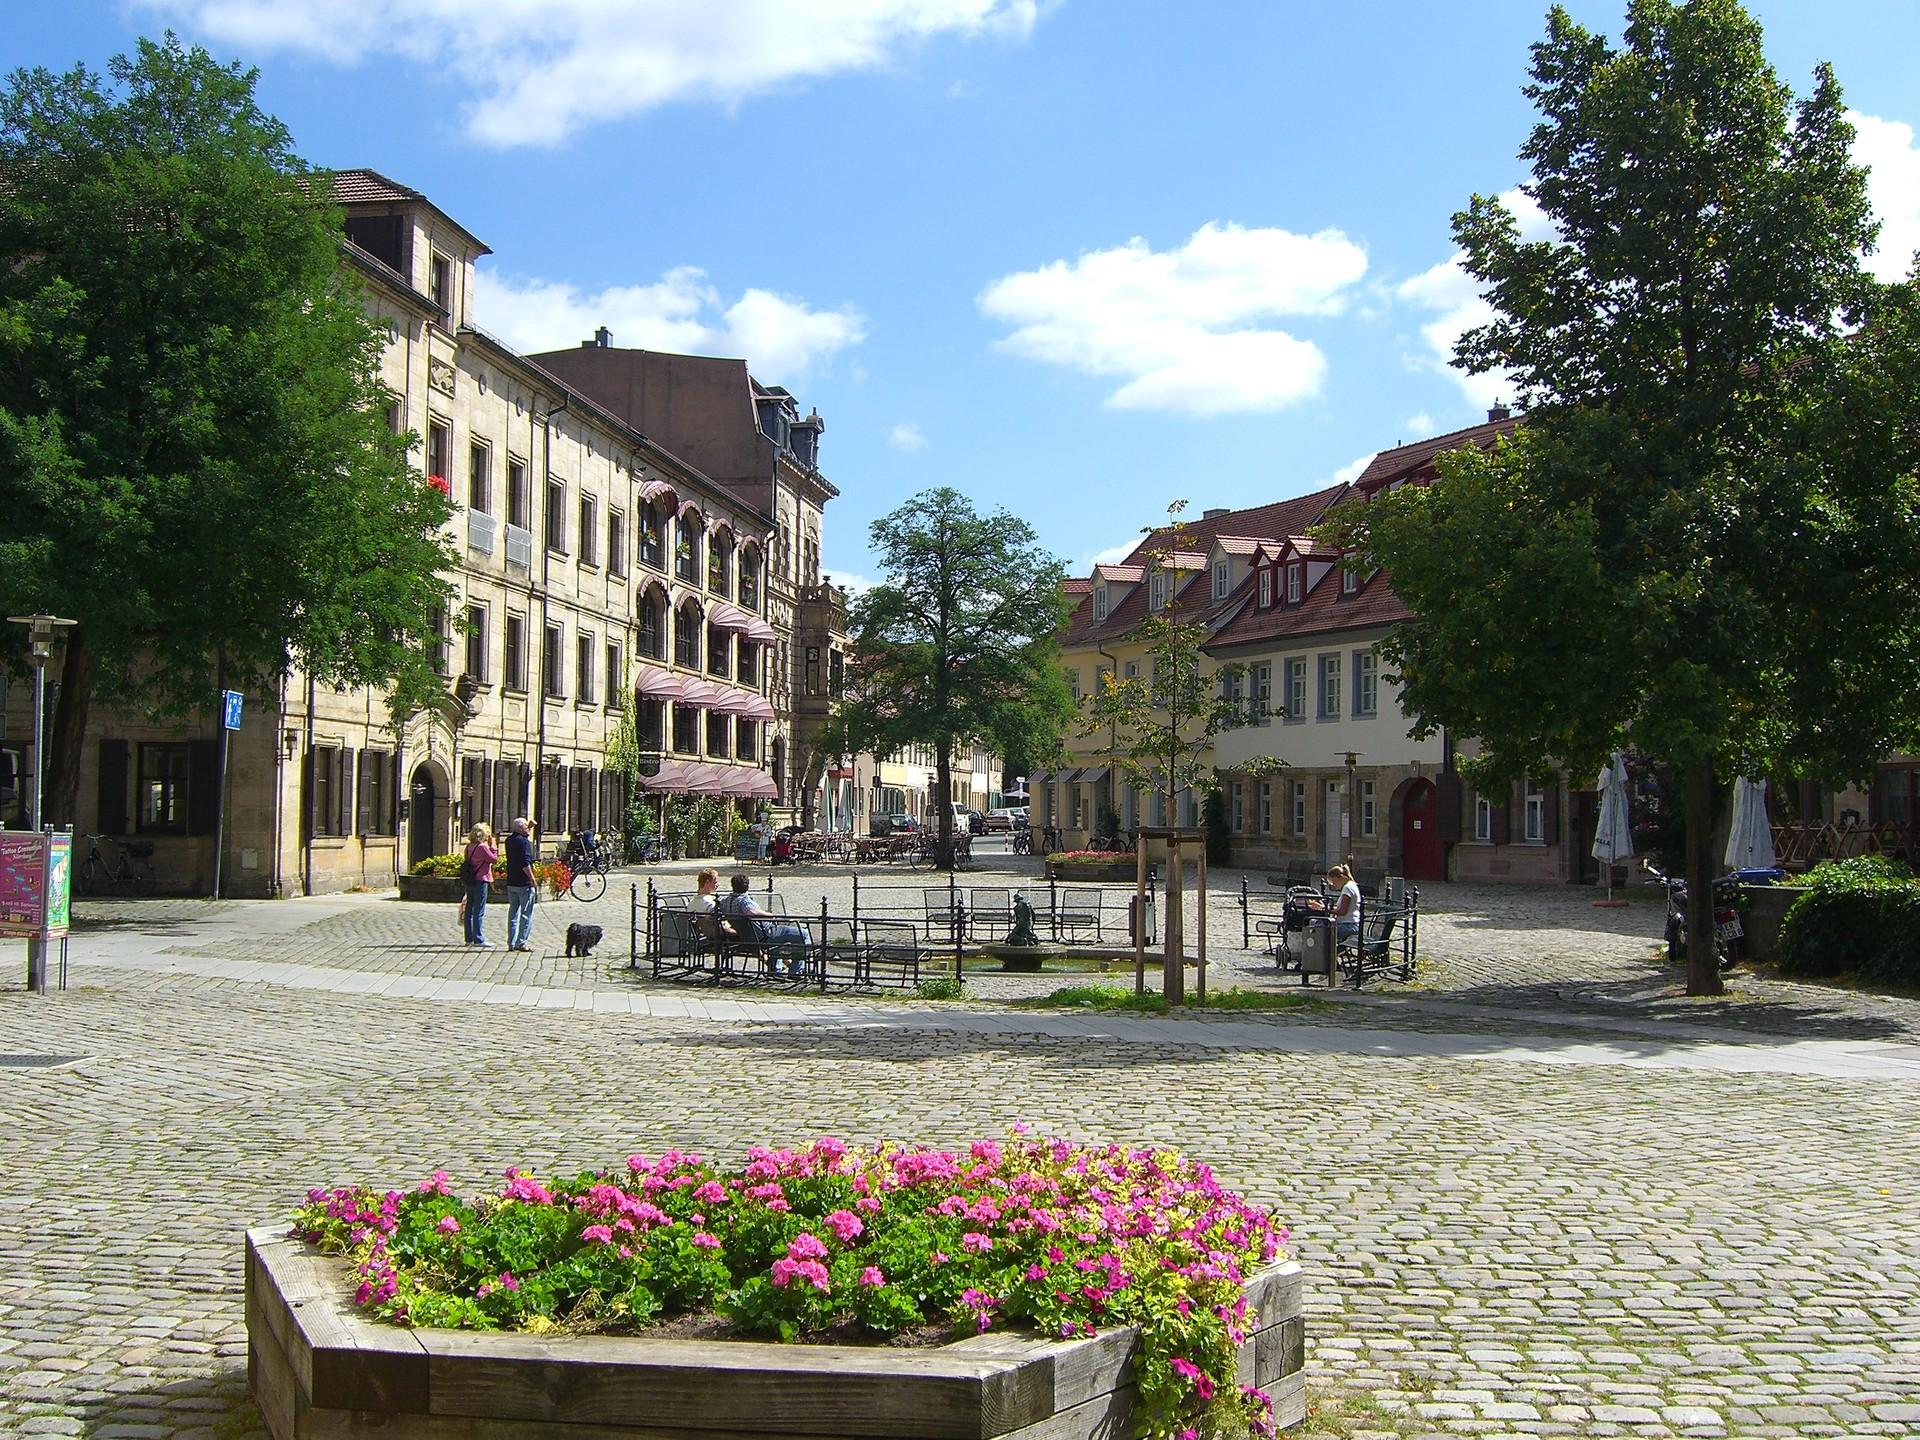 Experience at Friedrich-Alexander-Universität Erlangen-Nürnberg, Germany by Julian